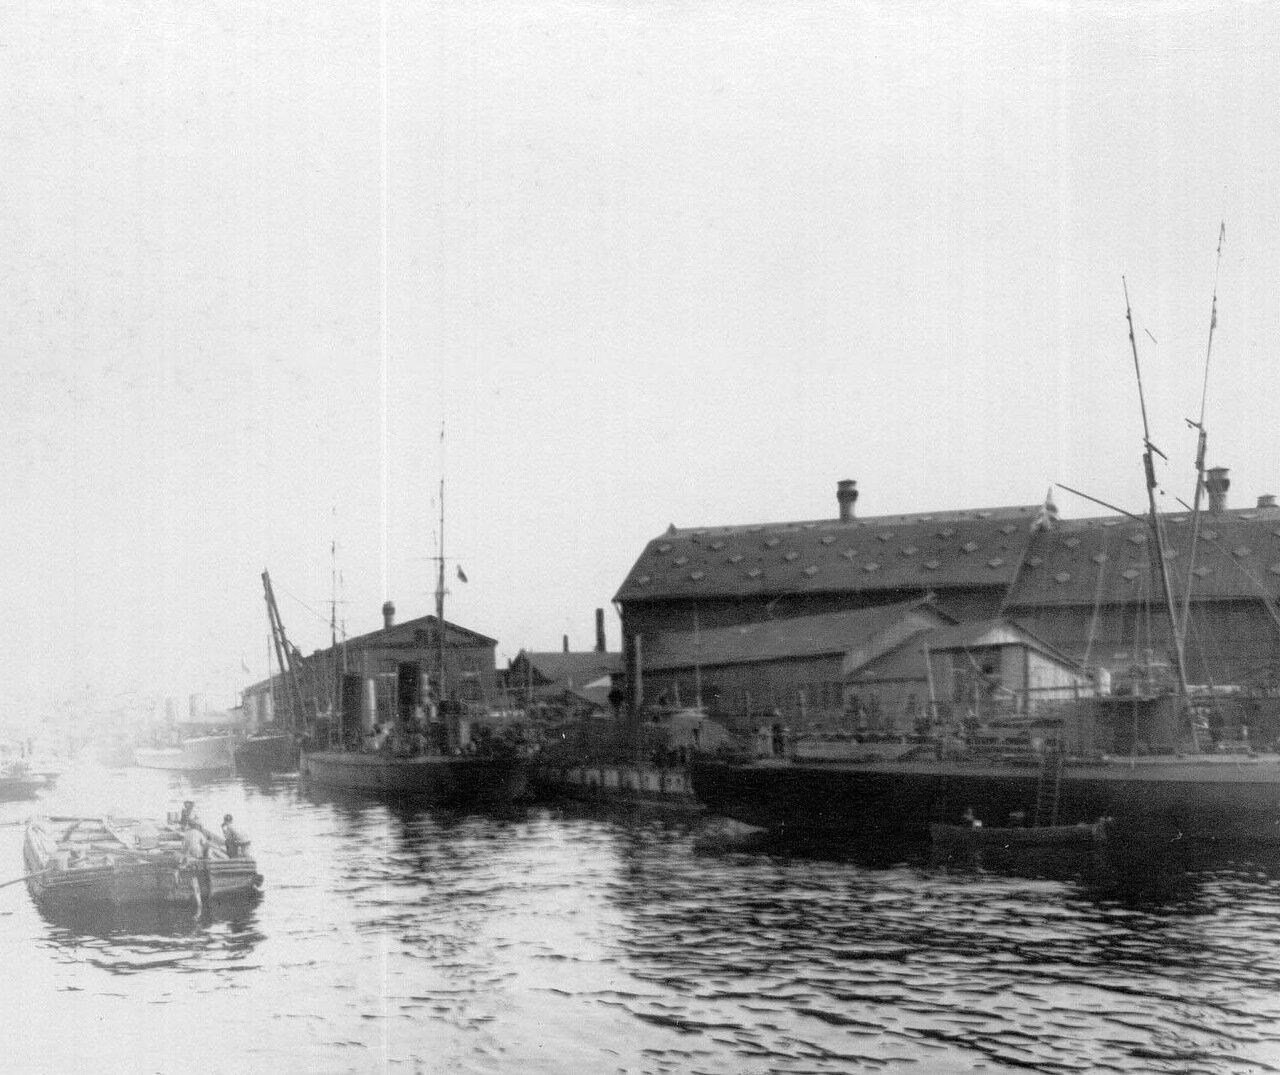 26. Корабли у причалов заводской пристани. 1911